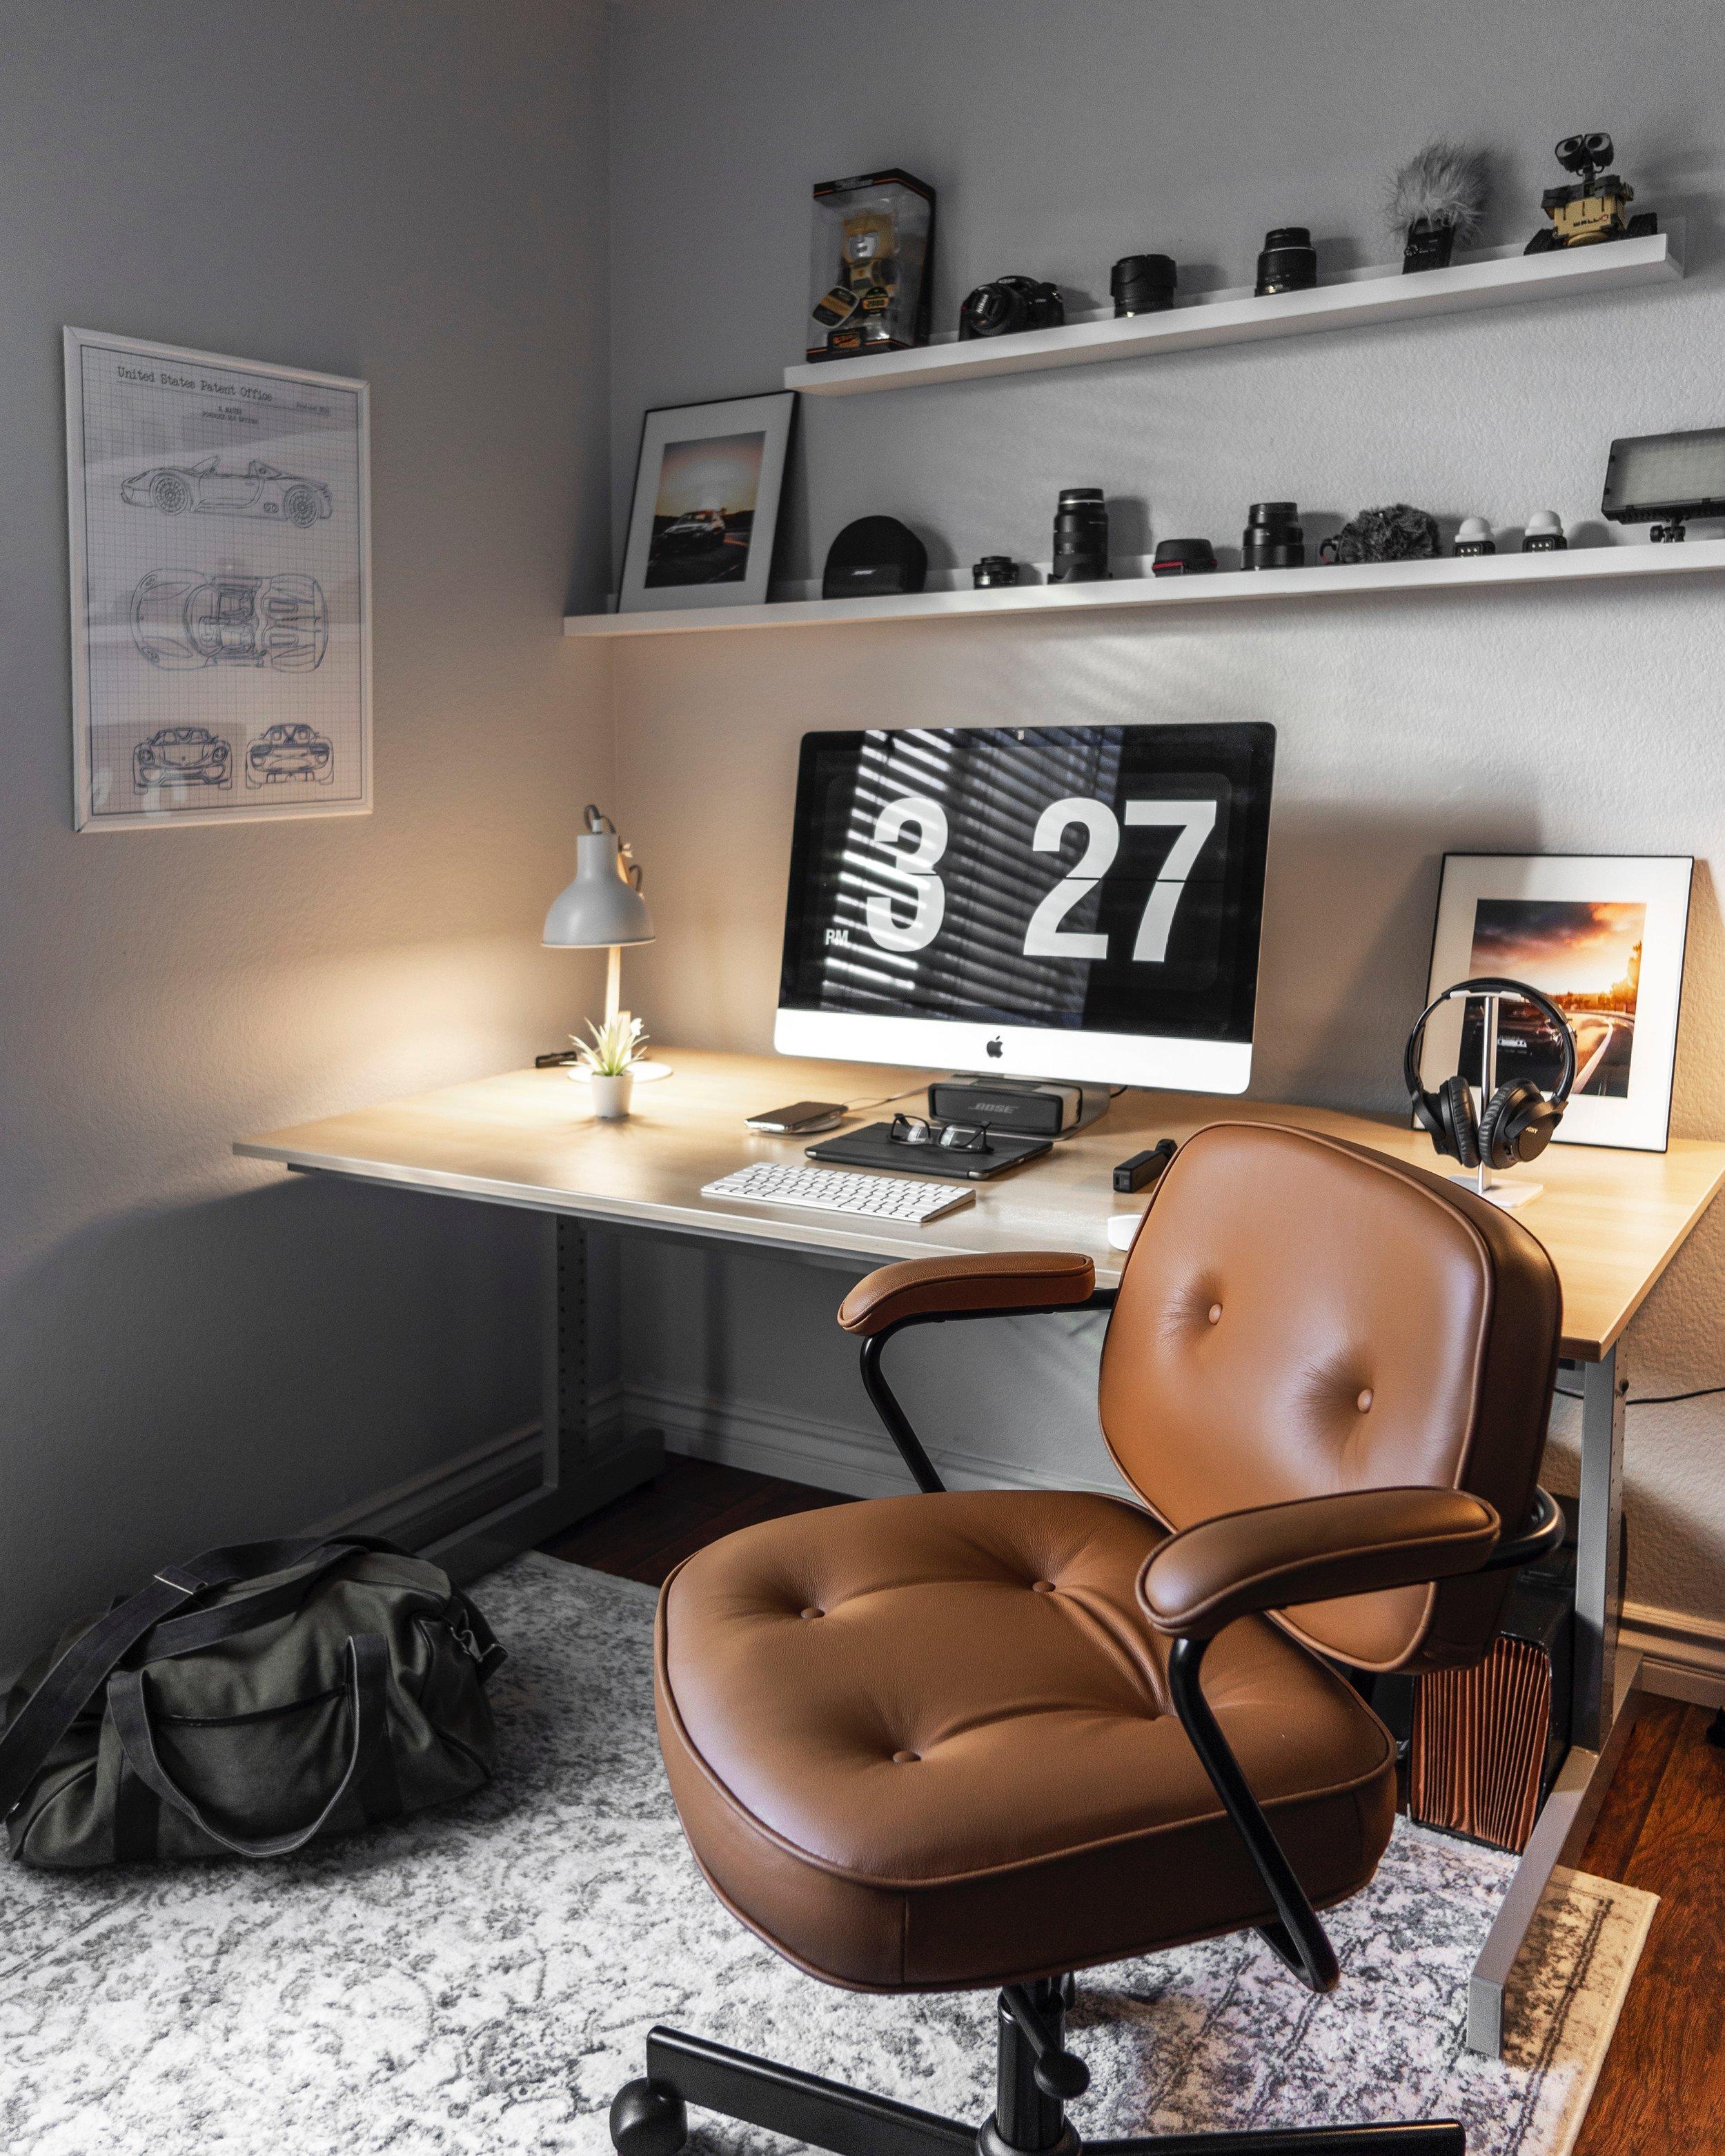 bk-designs-atlanta-ga-interior-designers-create-organization.jpg